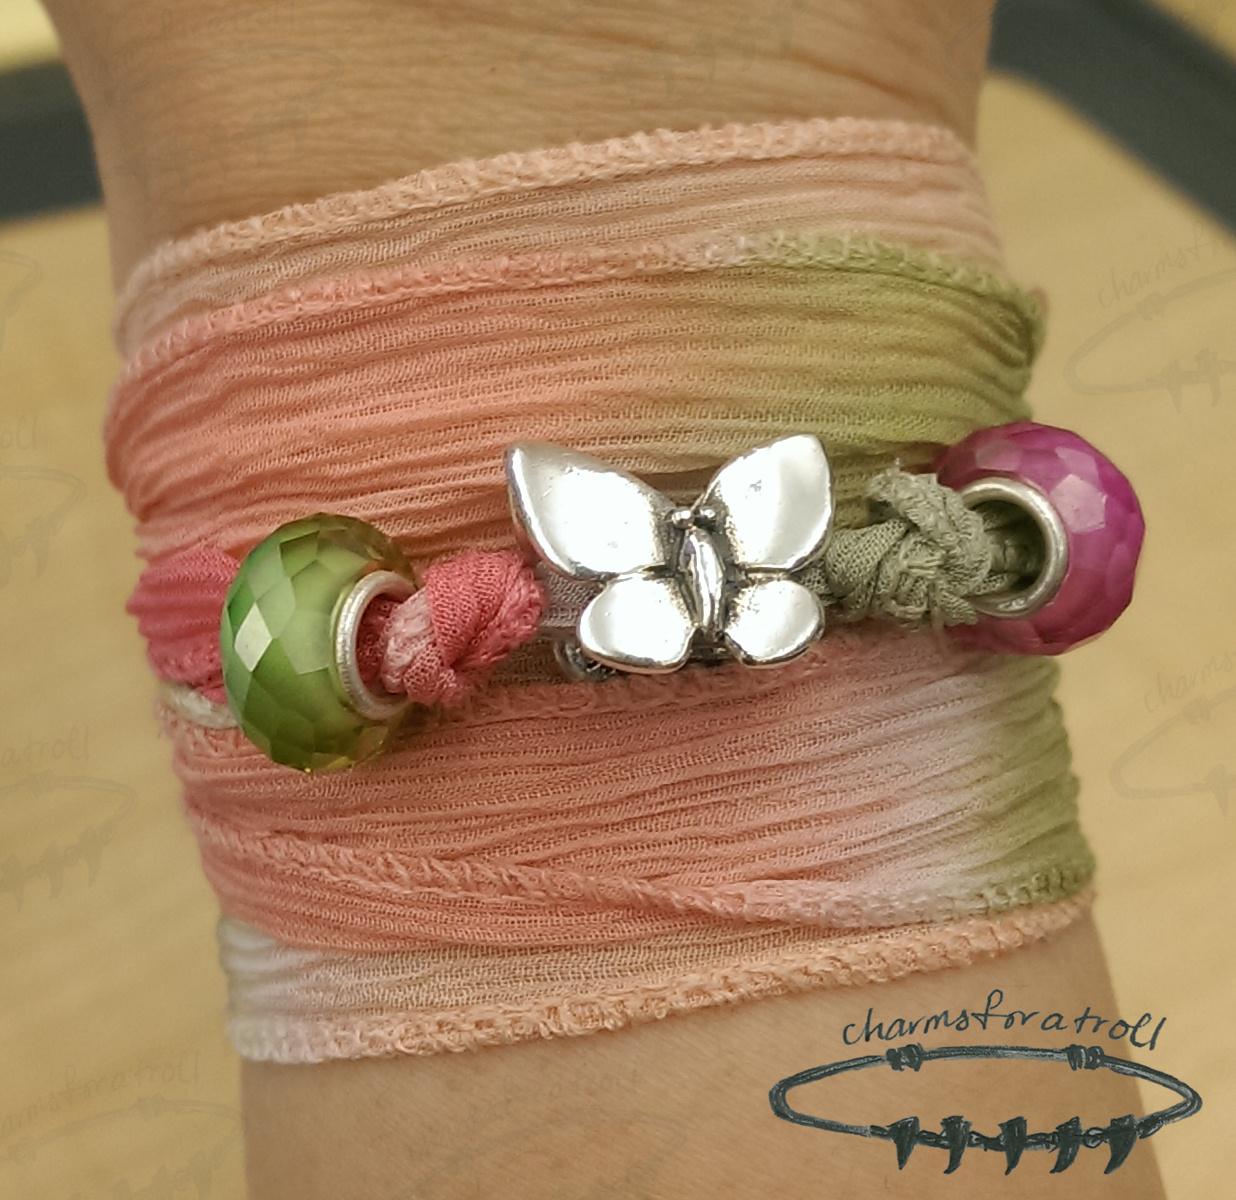 Novobeads Wild Rose Silk Wrap, Key Lime Mini CZ, Pink Lemonade Mini CZ, Trollbeads Fantasy Butterfly